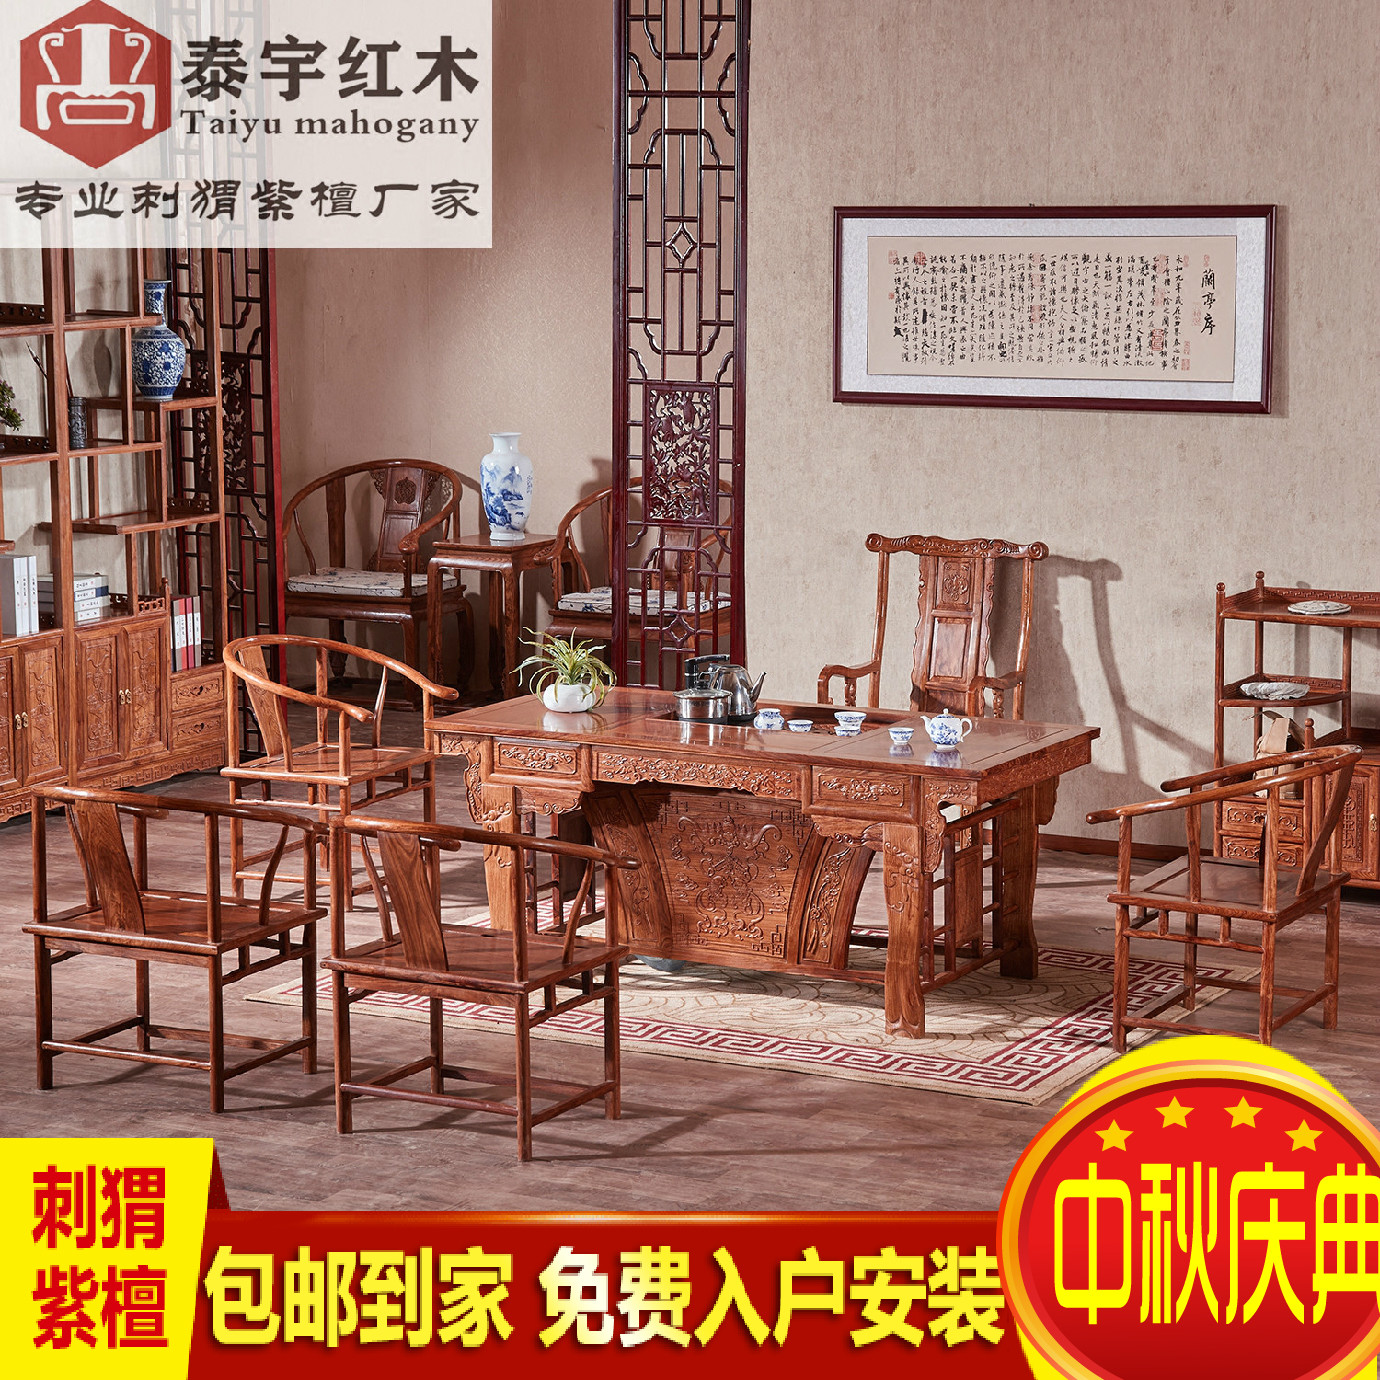 maxcare hardwood floors of e™Že…³ae¤…a¸‹e¼‰e™Že…³ae¤…e¨e¨ˆe™Že…³ae¤…e½a½œc regarding tb1mno3crppk1rjszffxxa5ppxa 0 item pic